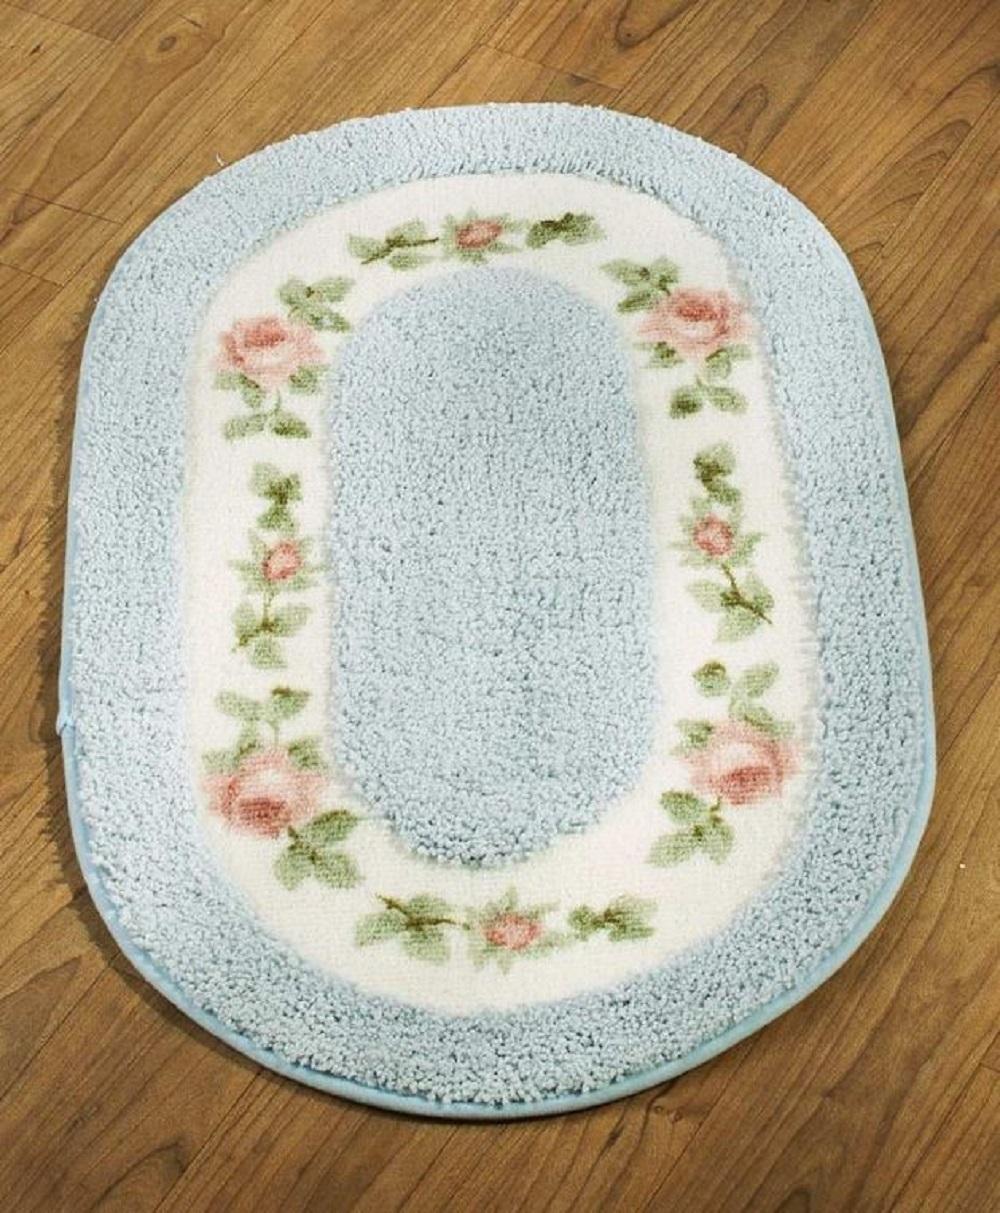 Floral Inset Bath Rug Nonskid Bathroom Runner Bedroom Dressing Room Home Decor